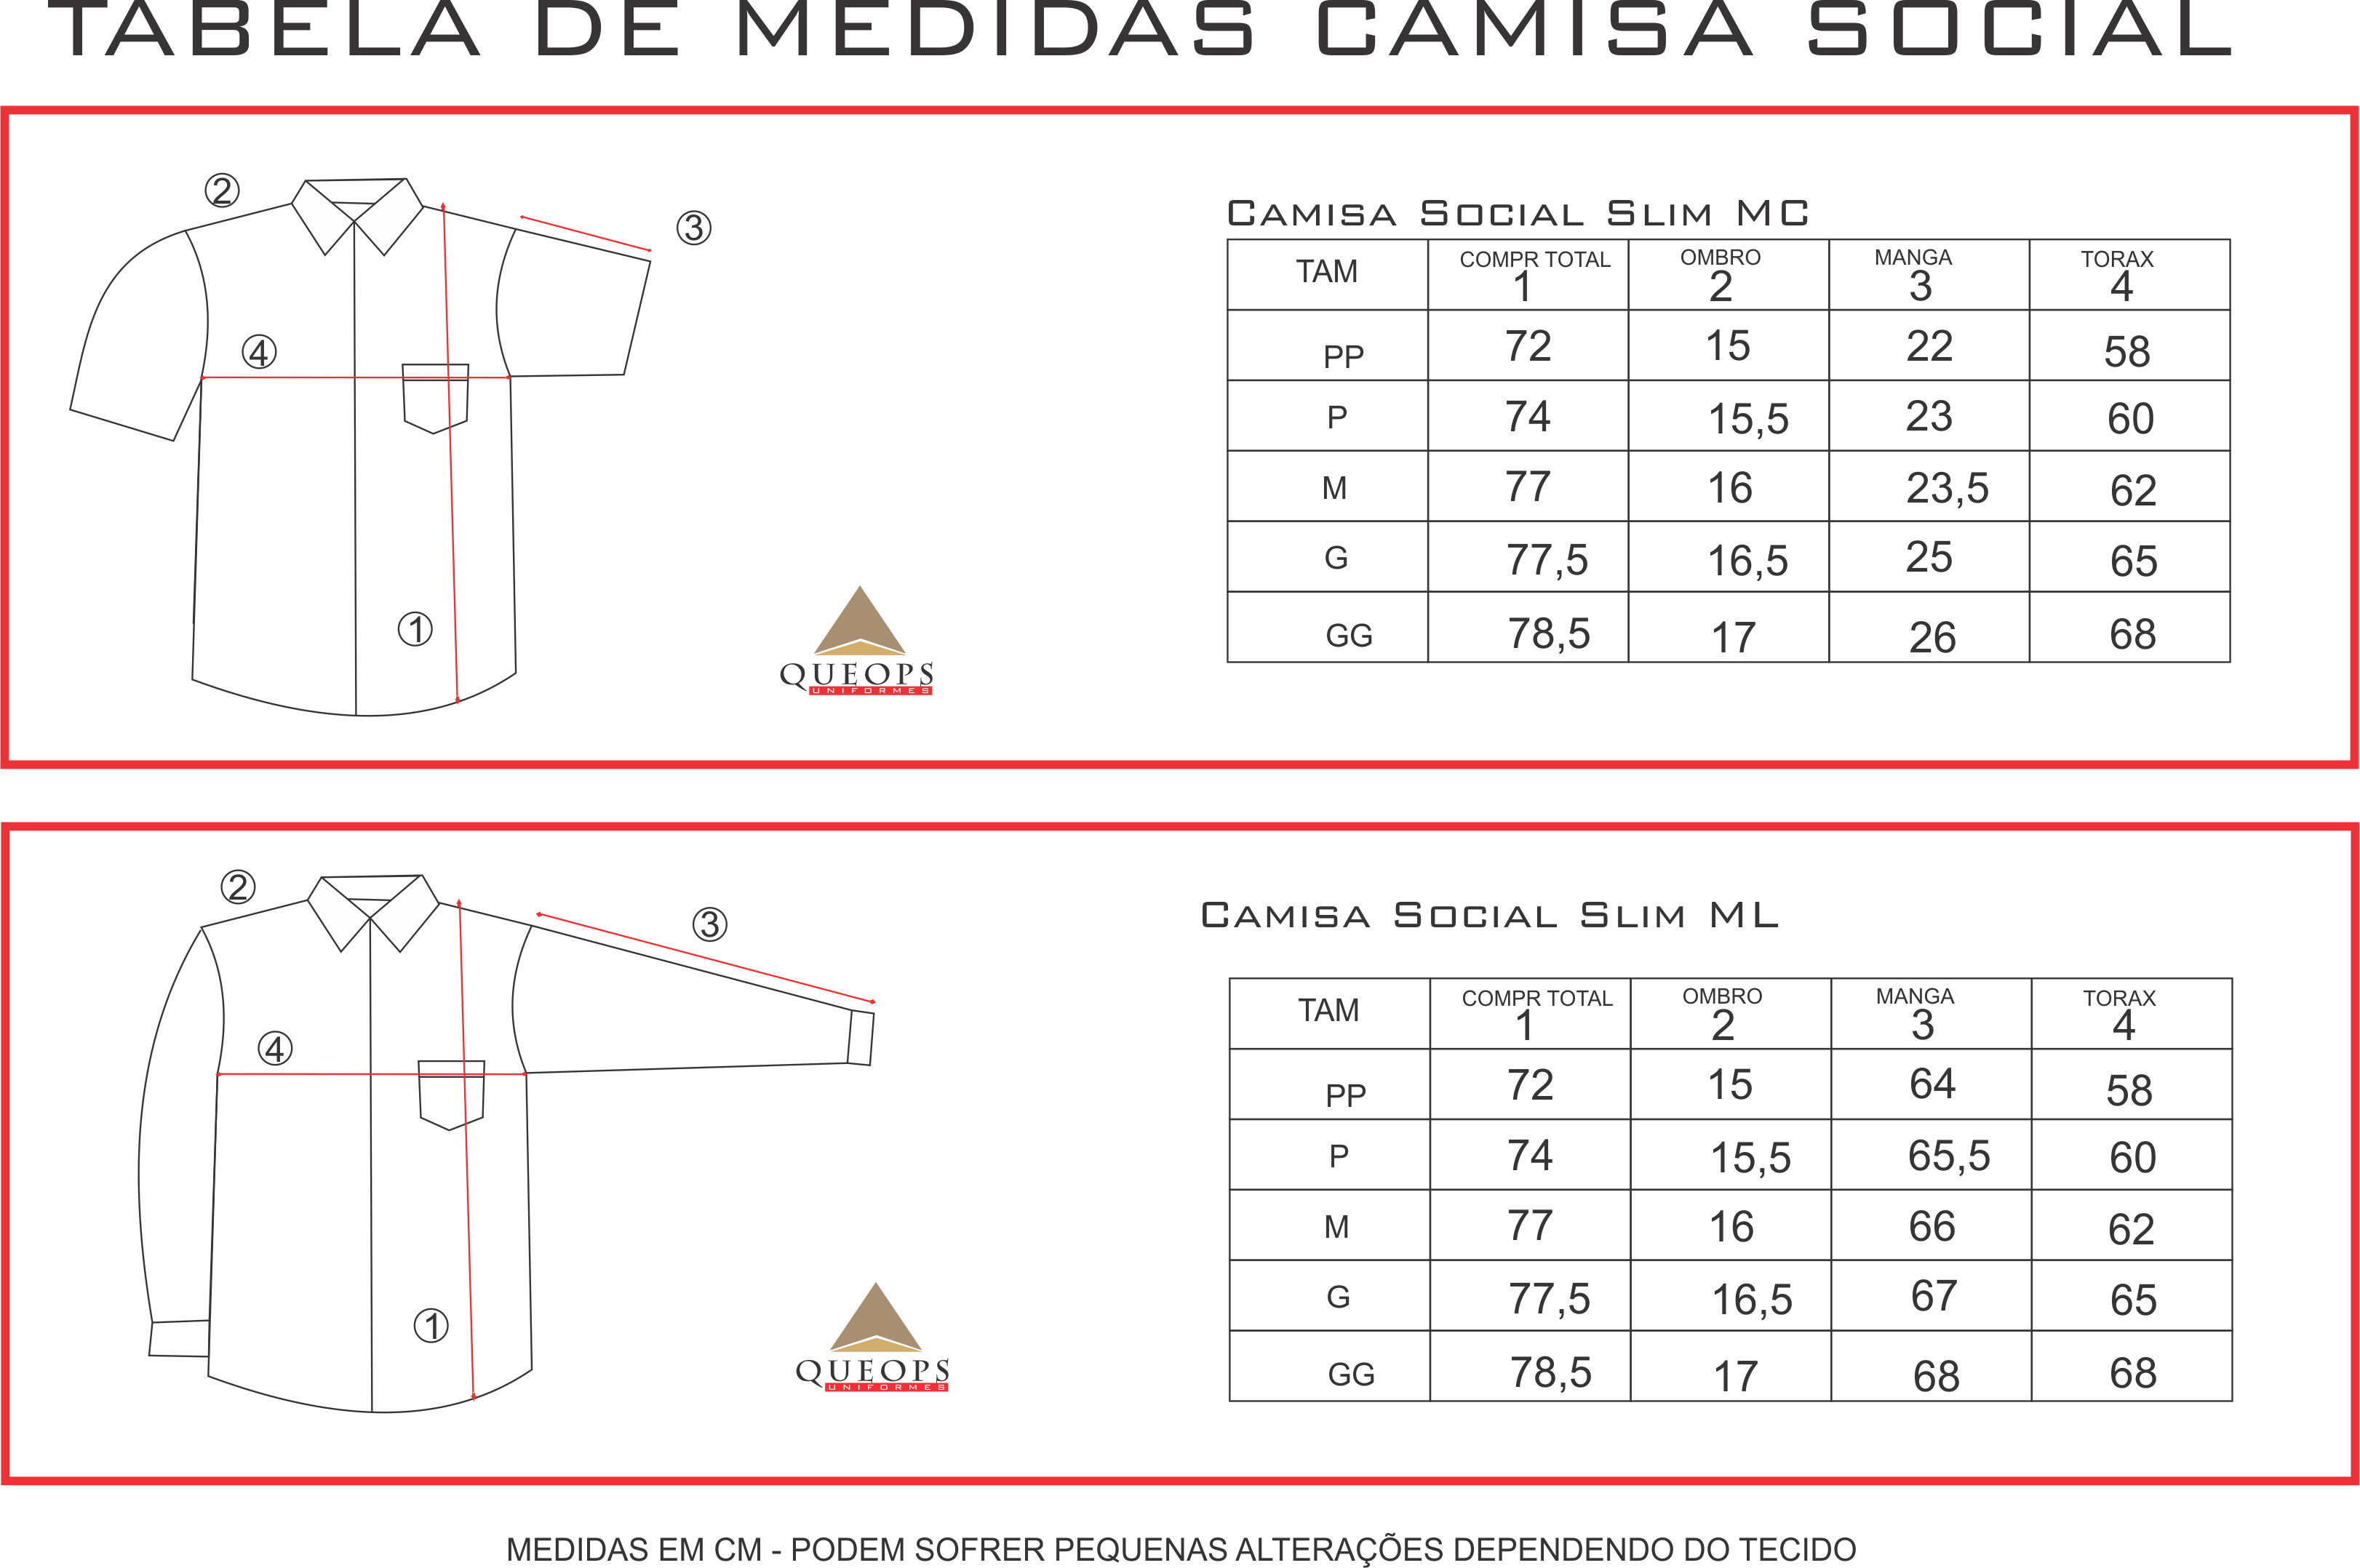 MEDIDAS CAMISAS